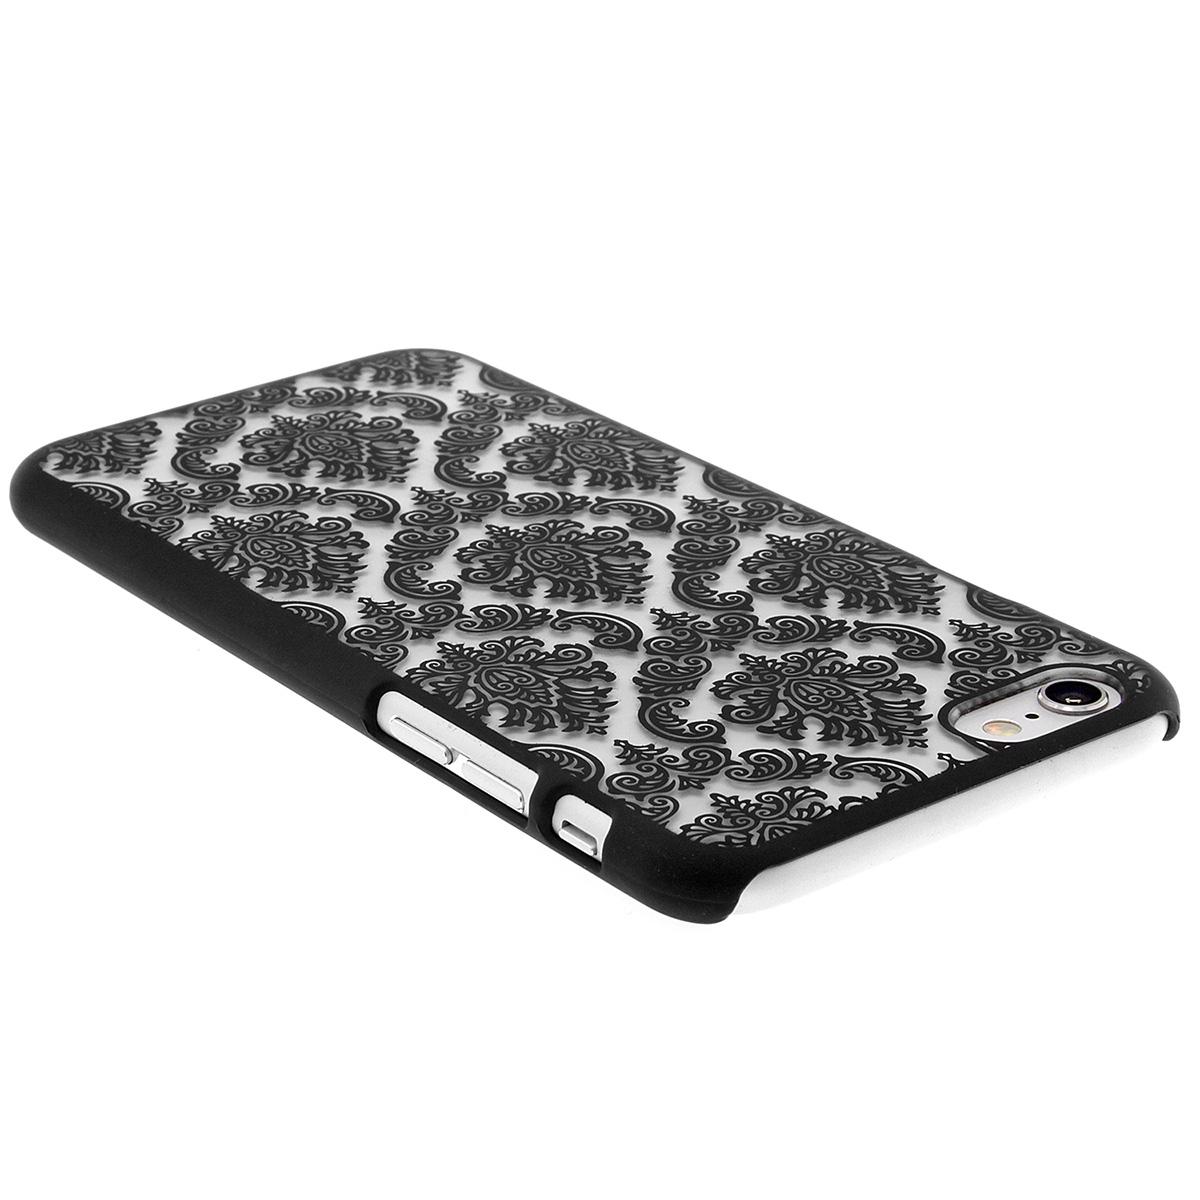 apple iphone 6 6s plus schutzh lle embossed blumen paisley muster case ebay. Black Bedroom Furniture Sets. Home Design Ideas